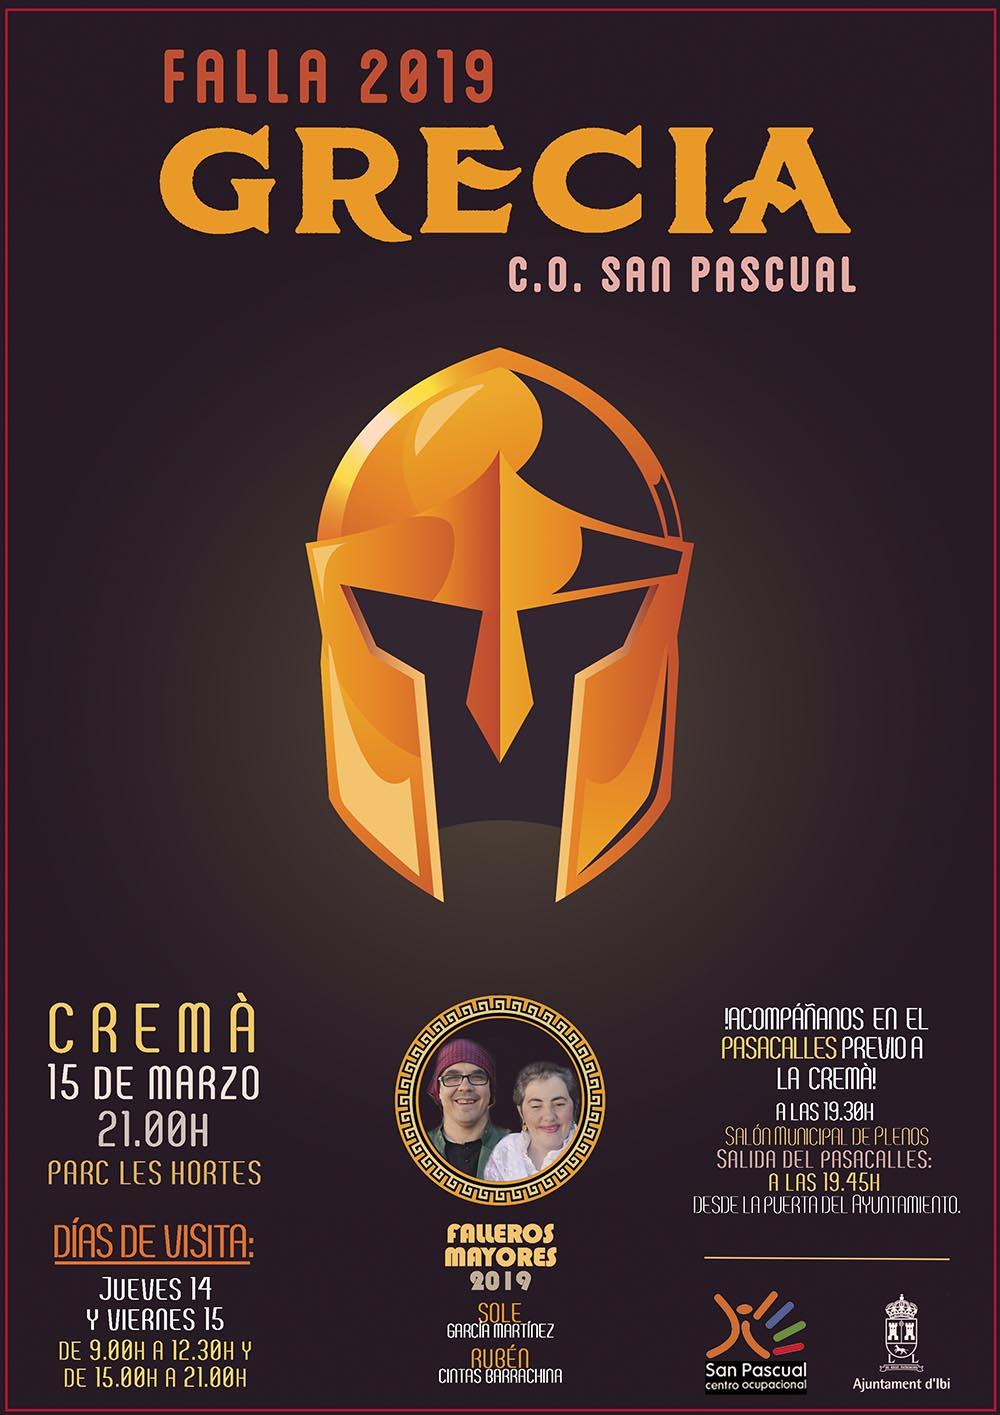 Falla Grecia 2019 C.O. SAN PASCUAL